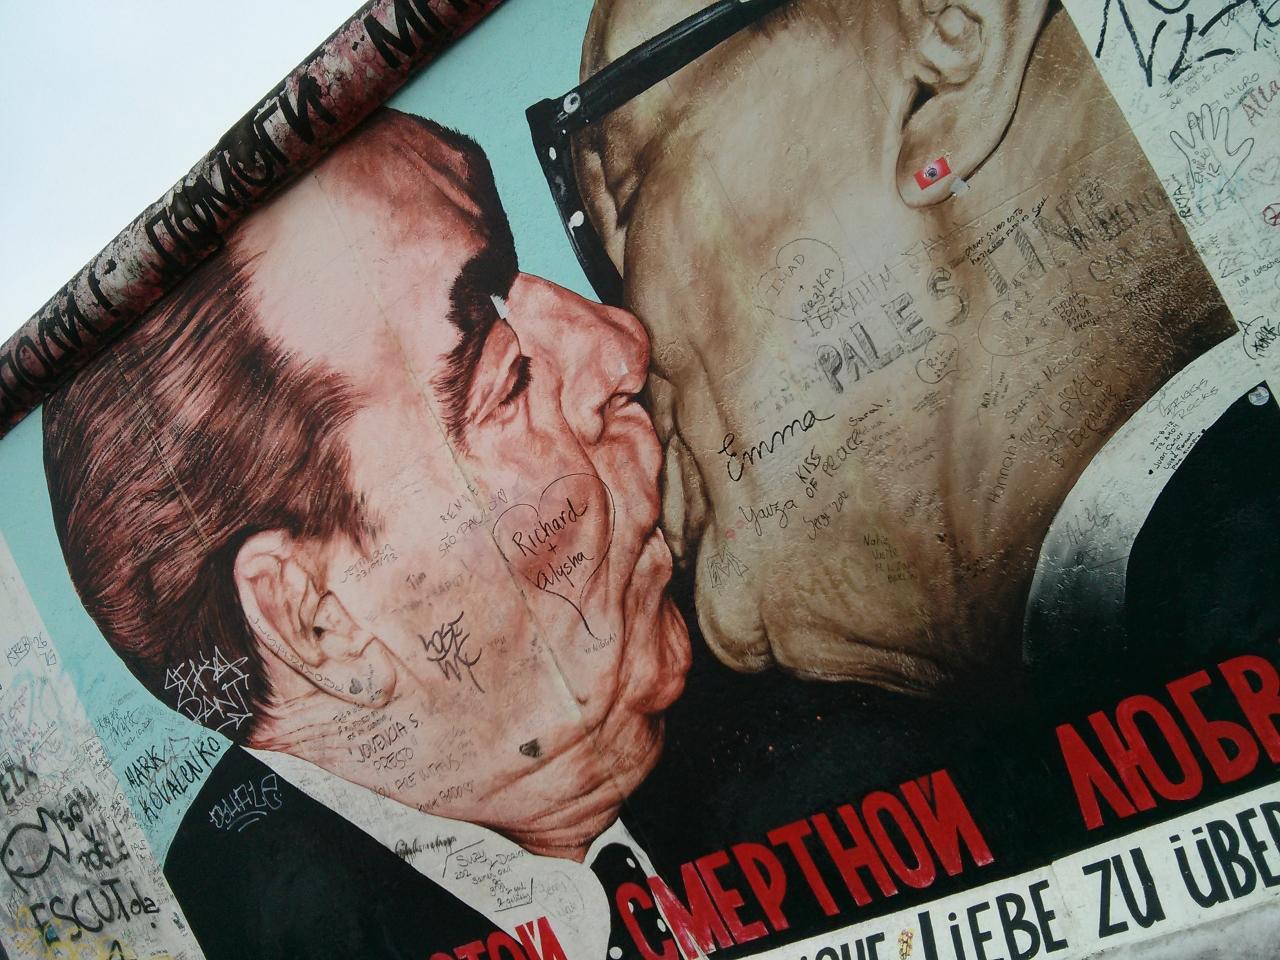 Brezhnev and Honecker kiss - East Side Gallery, Berlin Wall, Germany